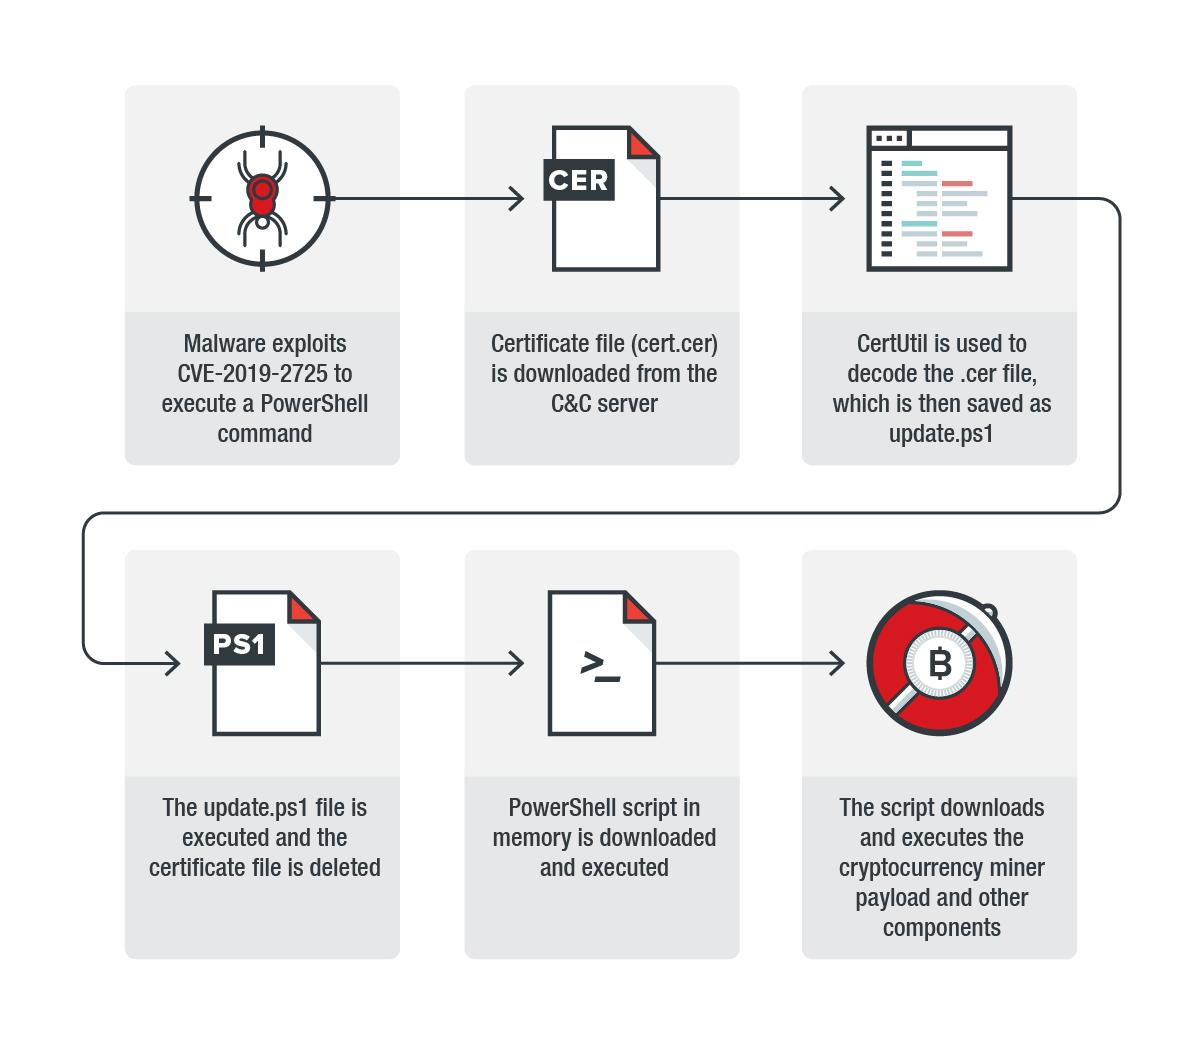 - oracle weblogic1 - Hackers Exploit Critical Oracle WebLogic Server Vulnerability